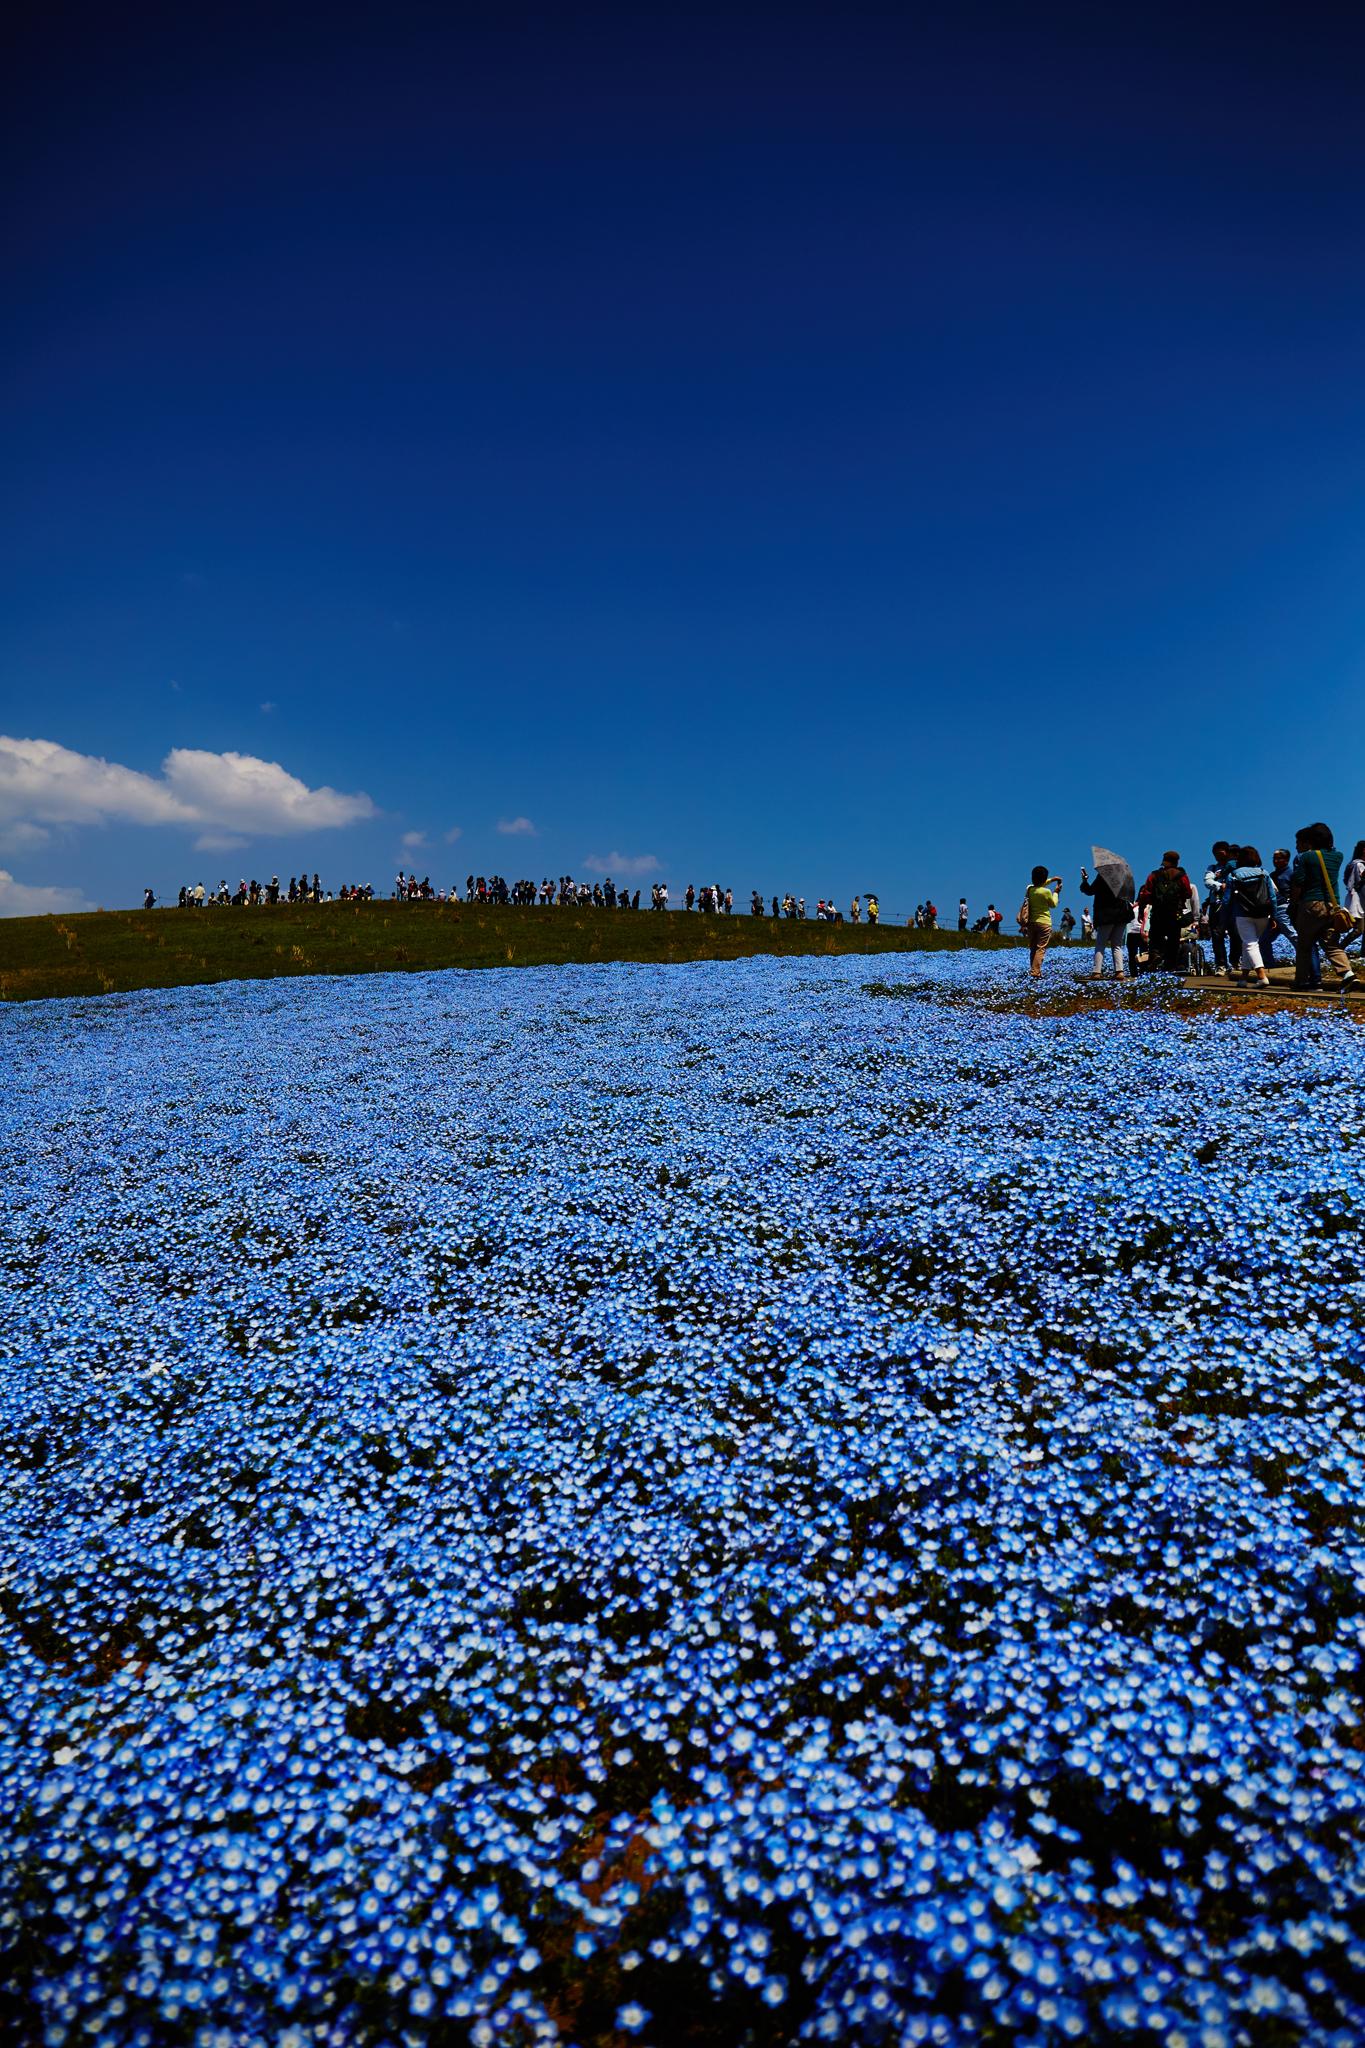 4k 5k壁紙で15年を振り返る ネモフィラで有名な国営ひたち海浜公園は茨城の鉄板観光スポットだ ハルカメラ Halcamera Com